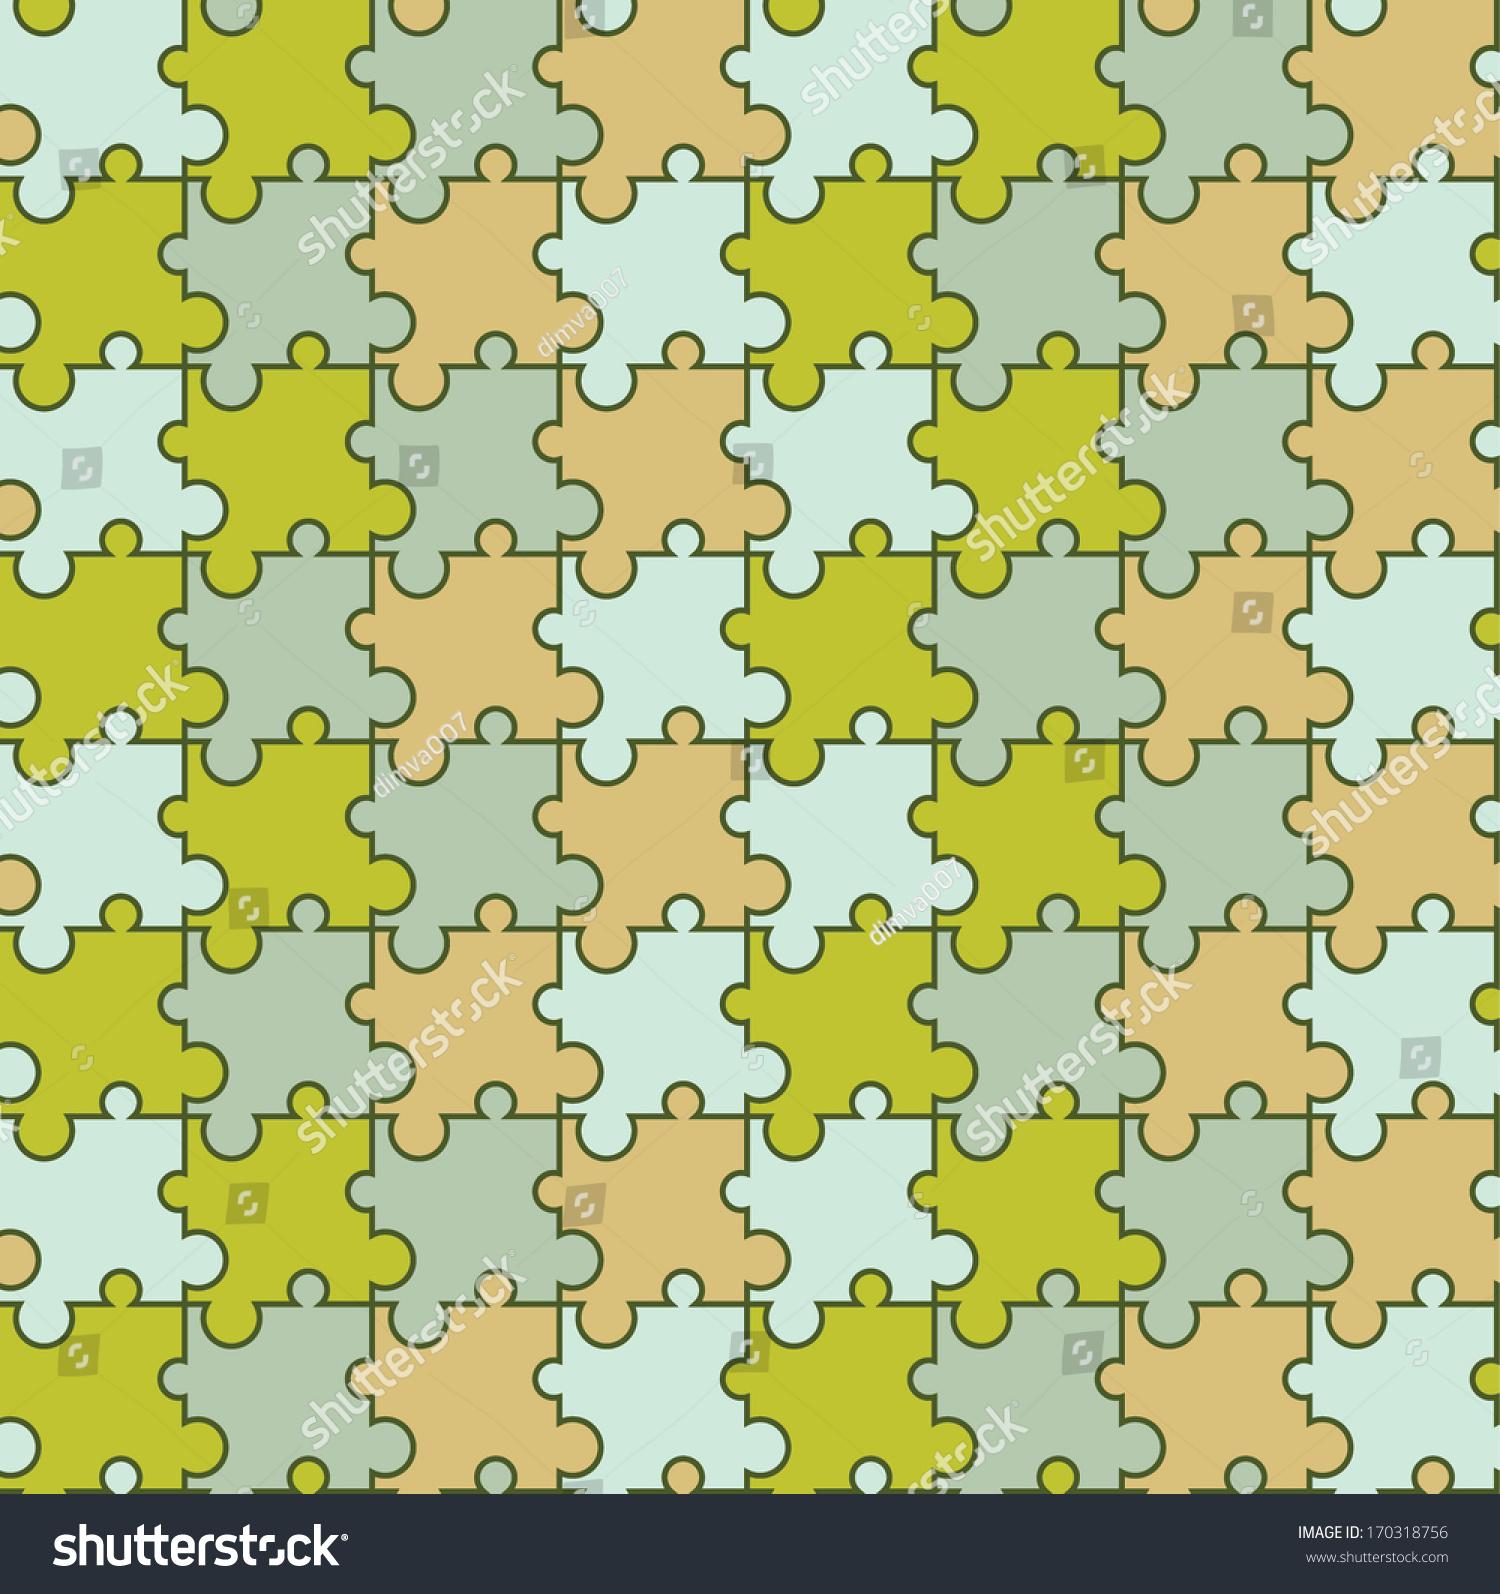 Type Of Patterned Carpet Crossword Clue Carpet Vidalondon